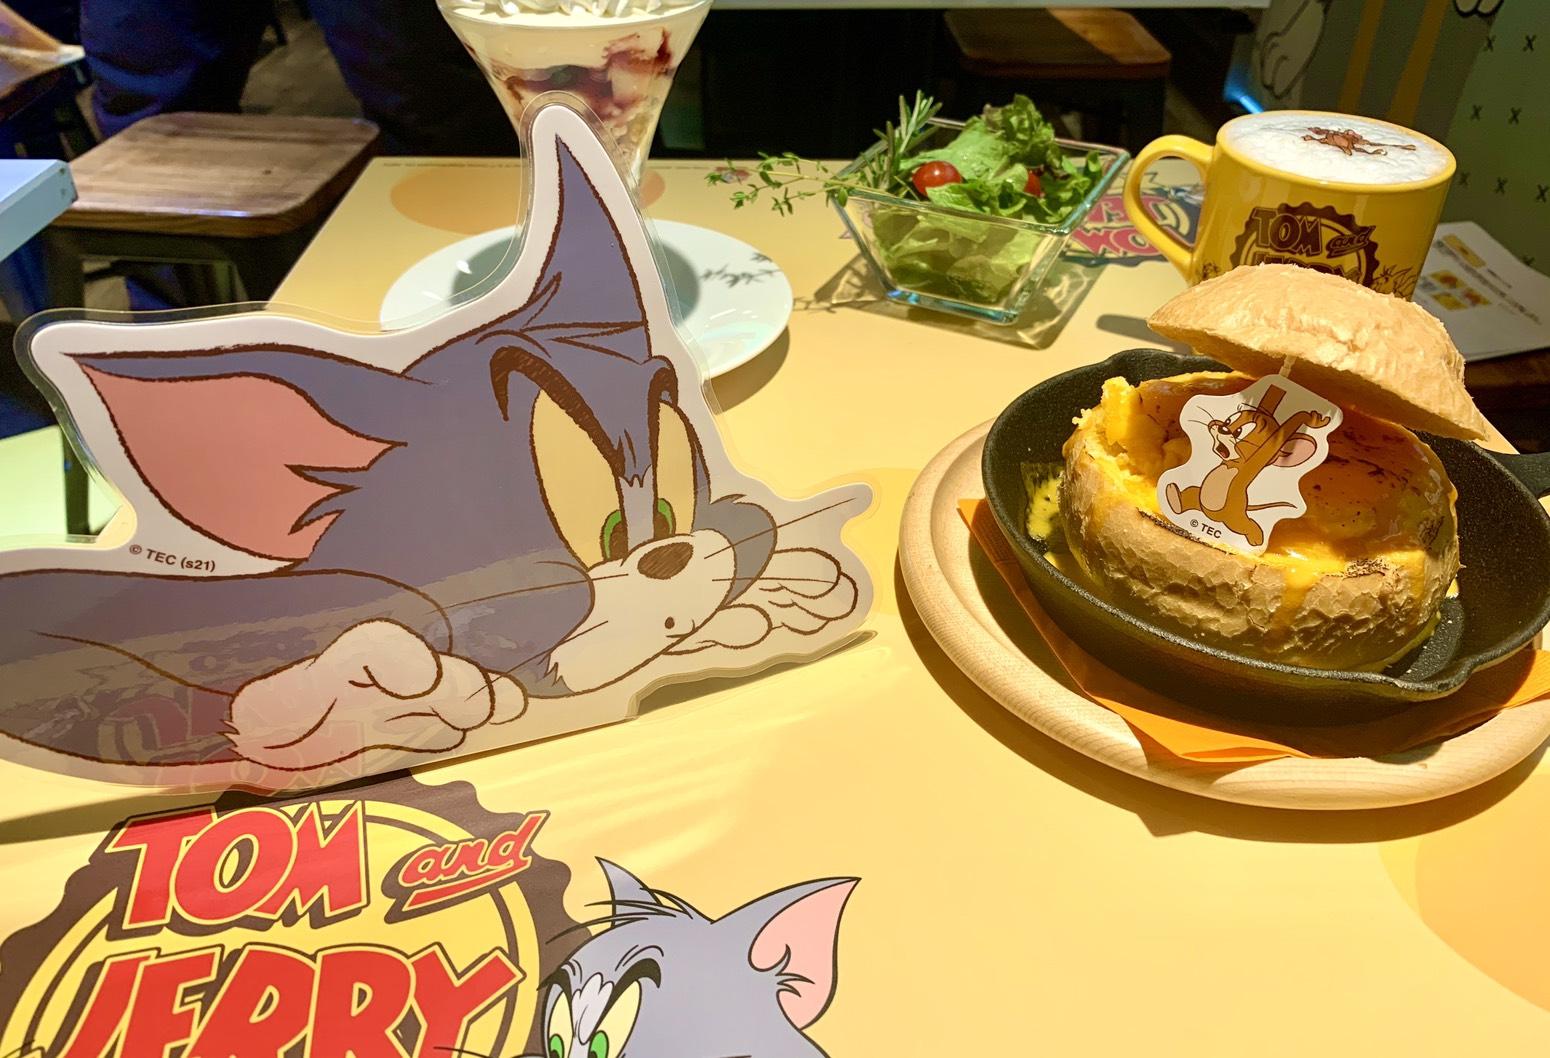 「Tom and Jerry ブレッドポットチーズカレー」と「Tom サンデー」、「カフェラテ」